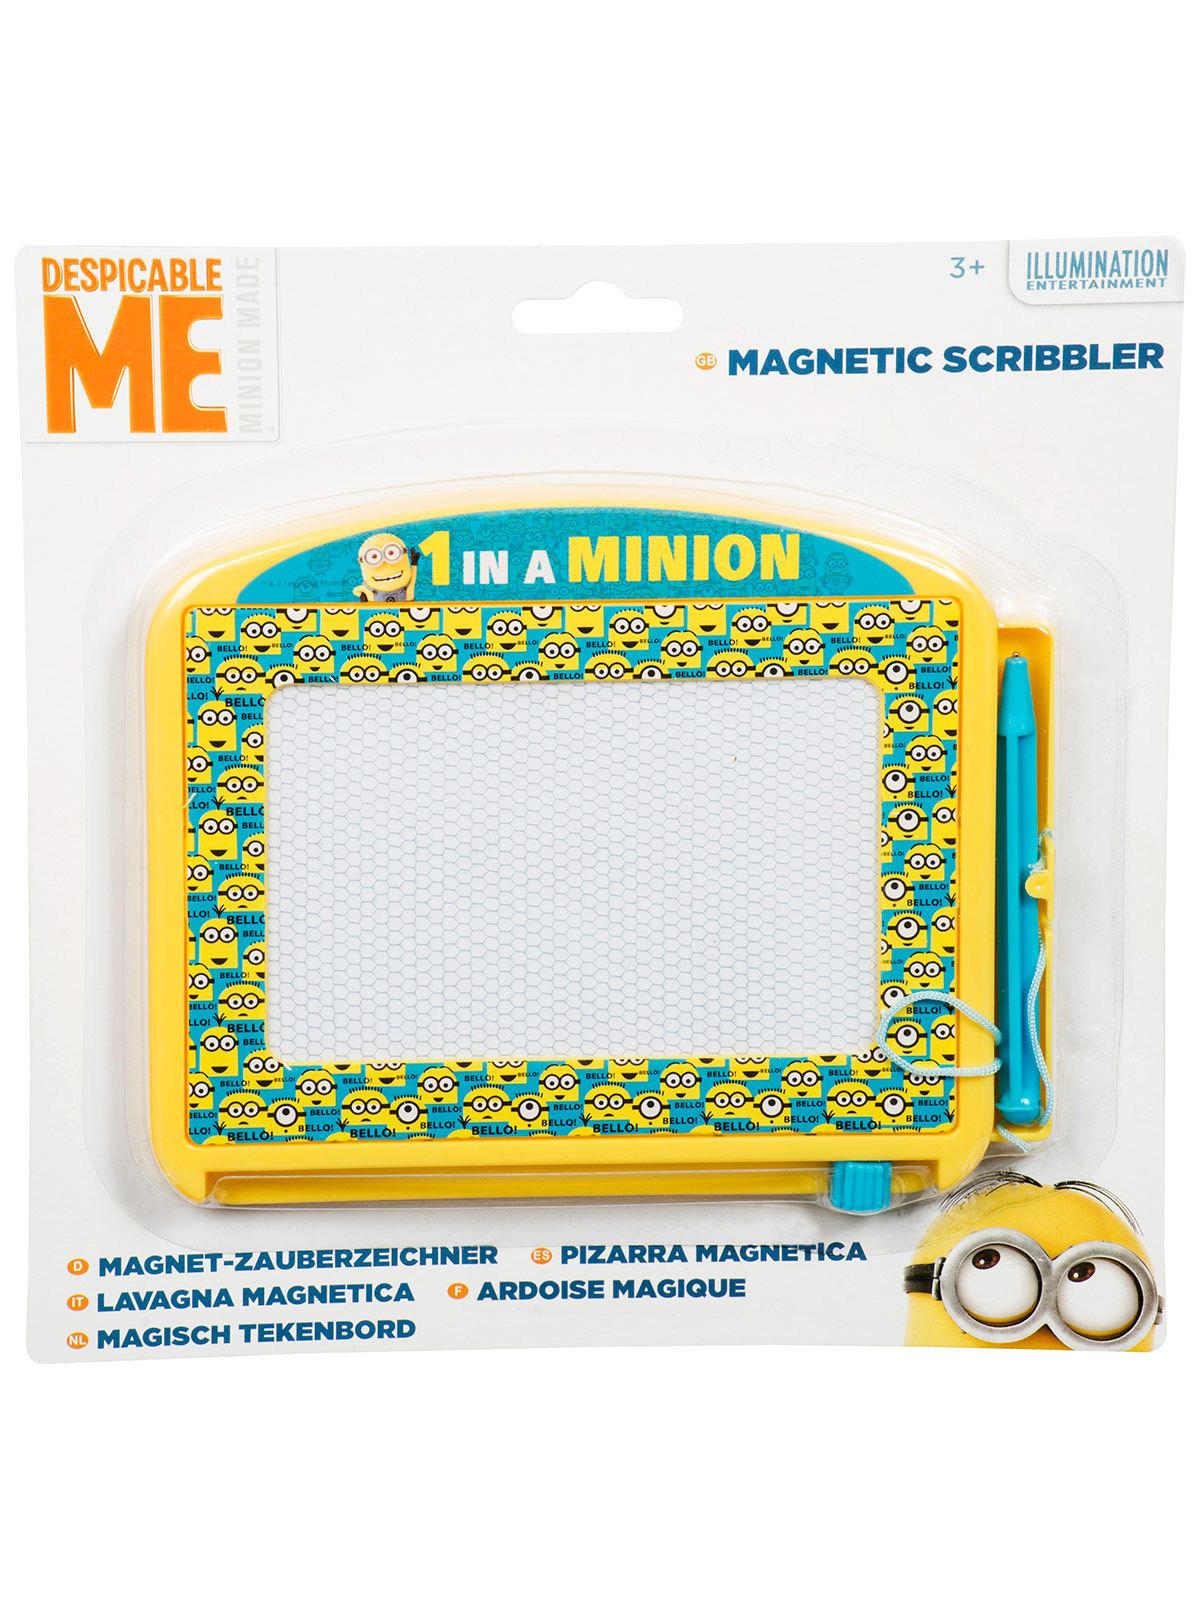 minions magnettafel kinder-maltafel gelb-blau 17x15cm , günstige